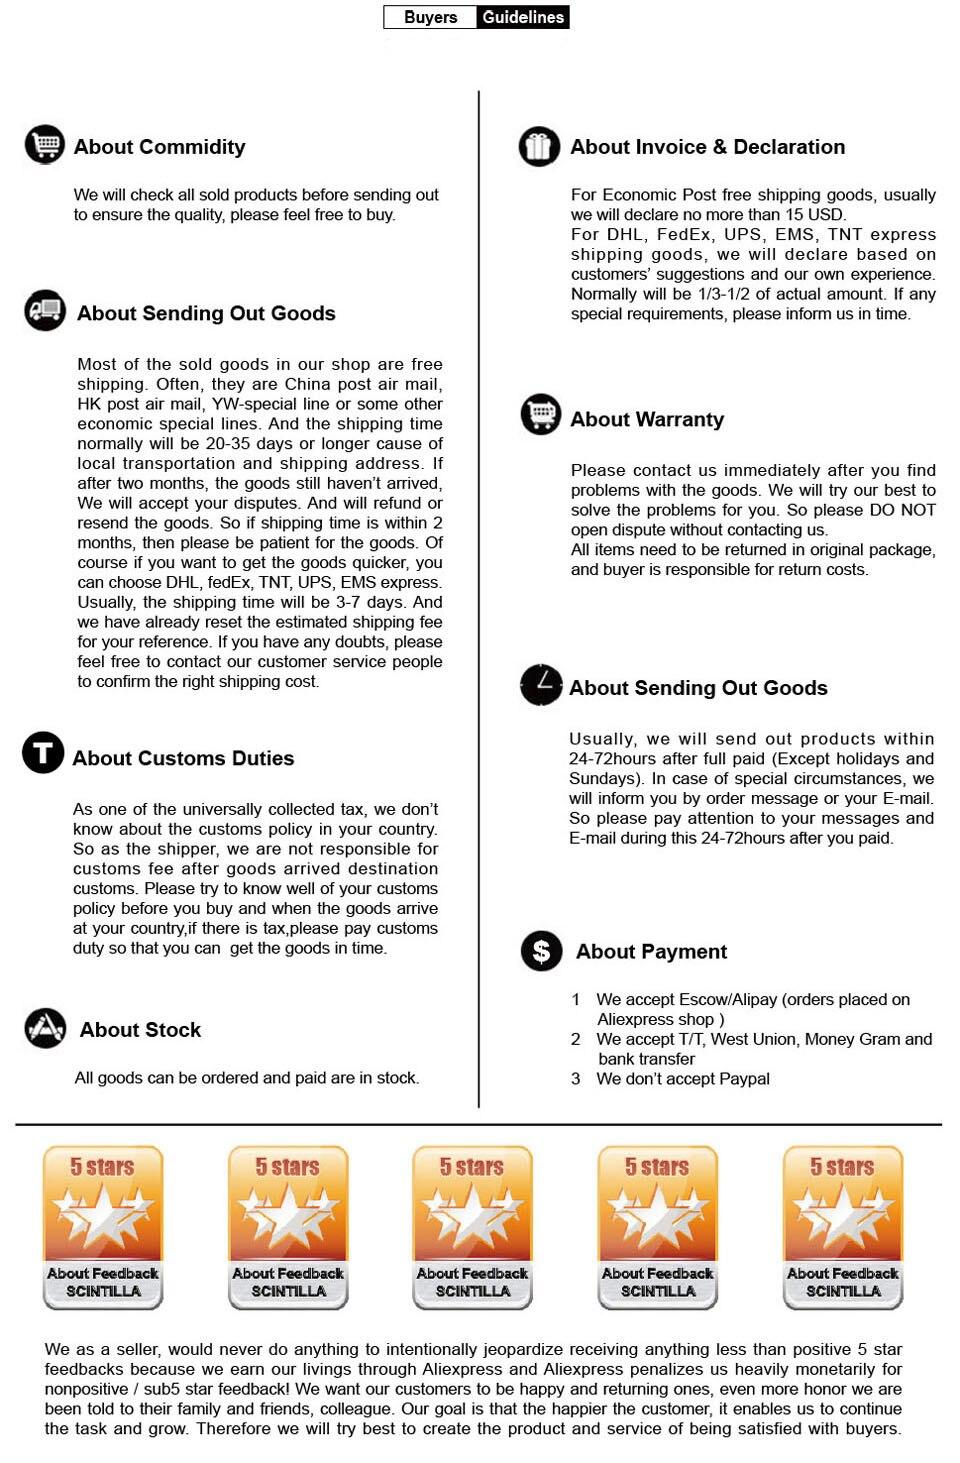 buyer guideline